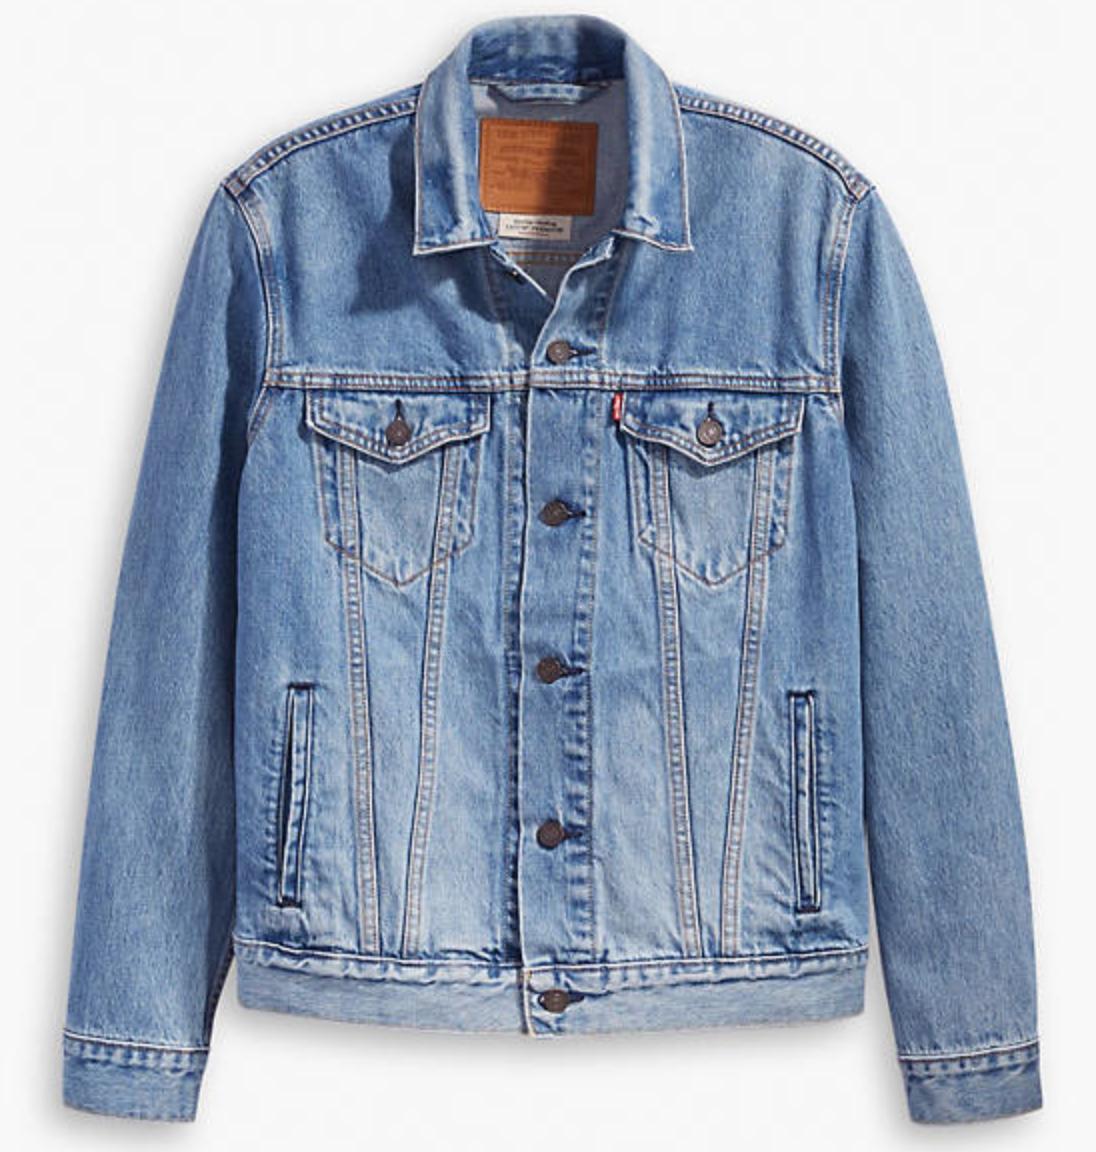 Levi's Premium Men's Denim Trucker Jacket - £20.00 instore @ Topman, Birmingham Bullring